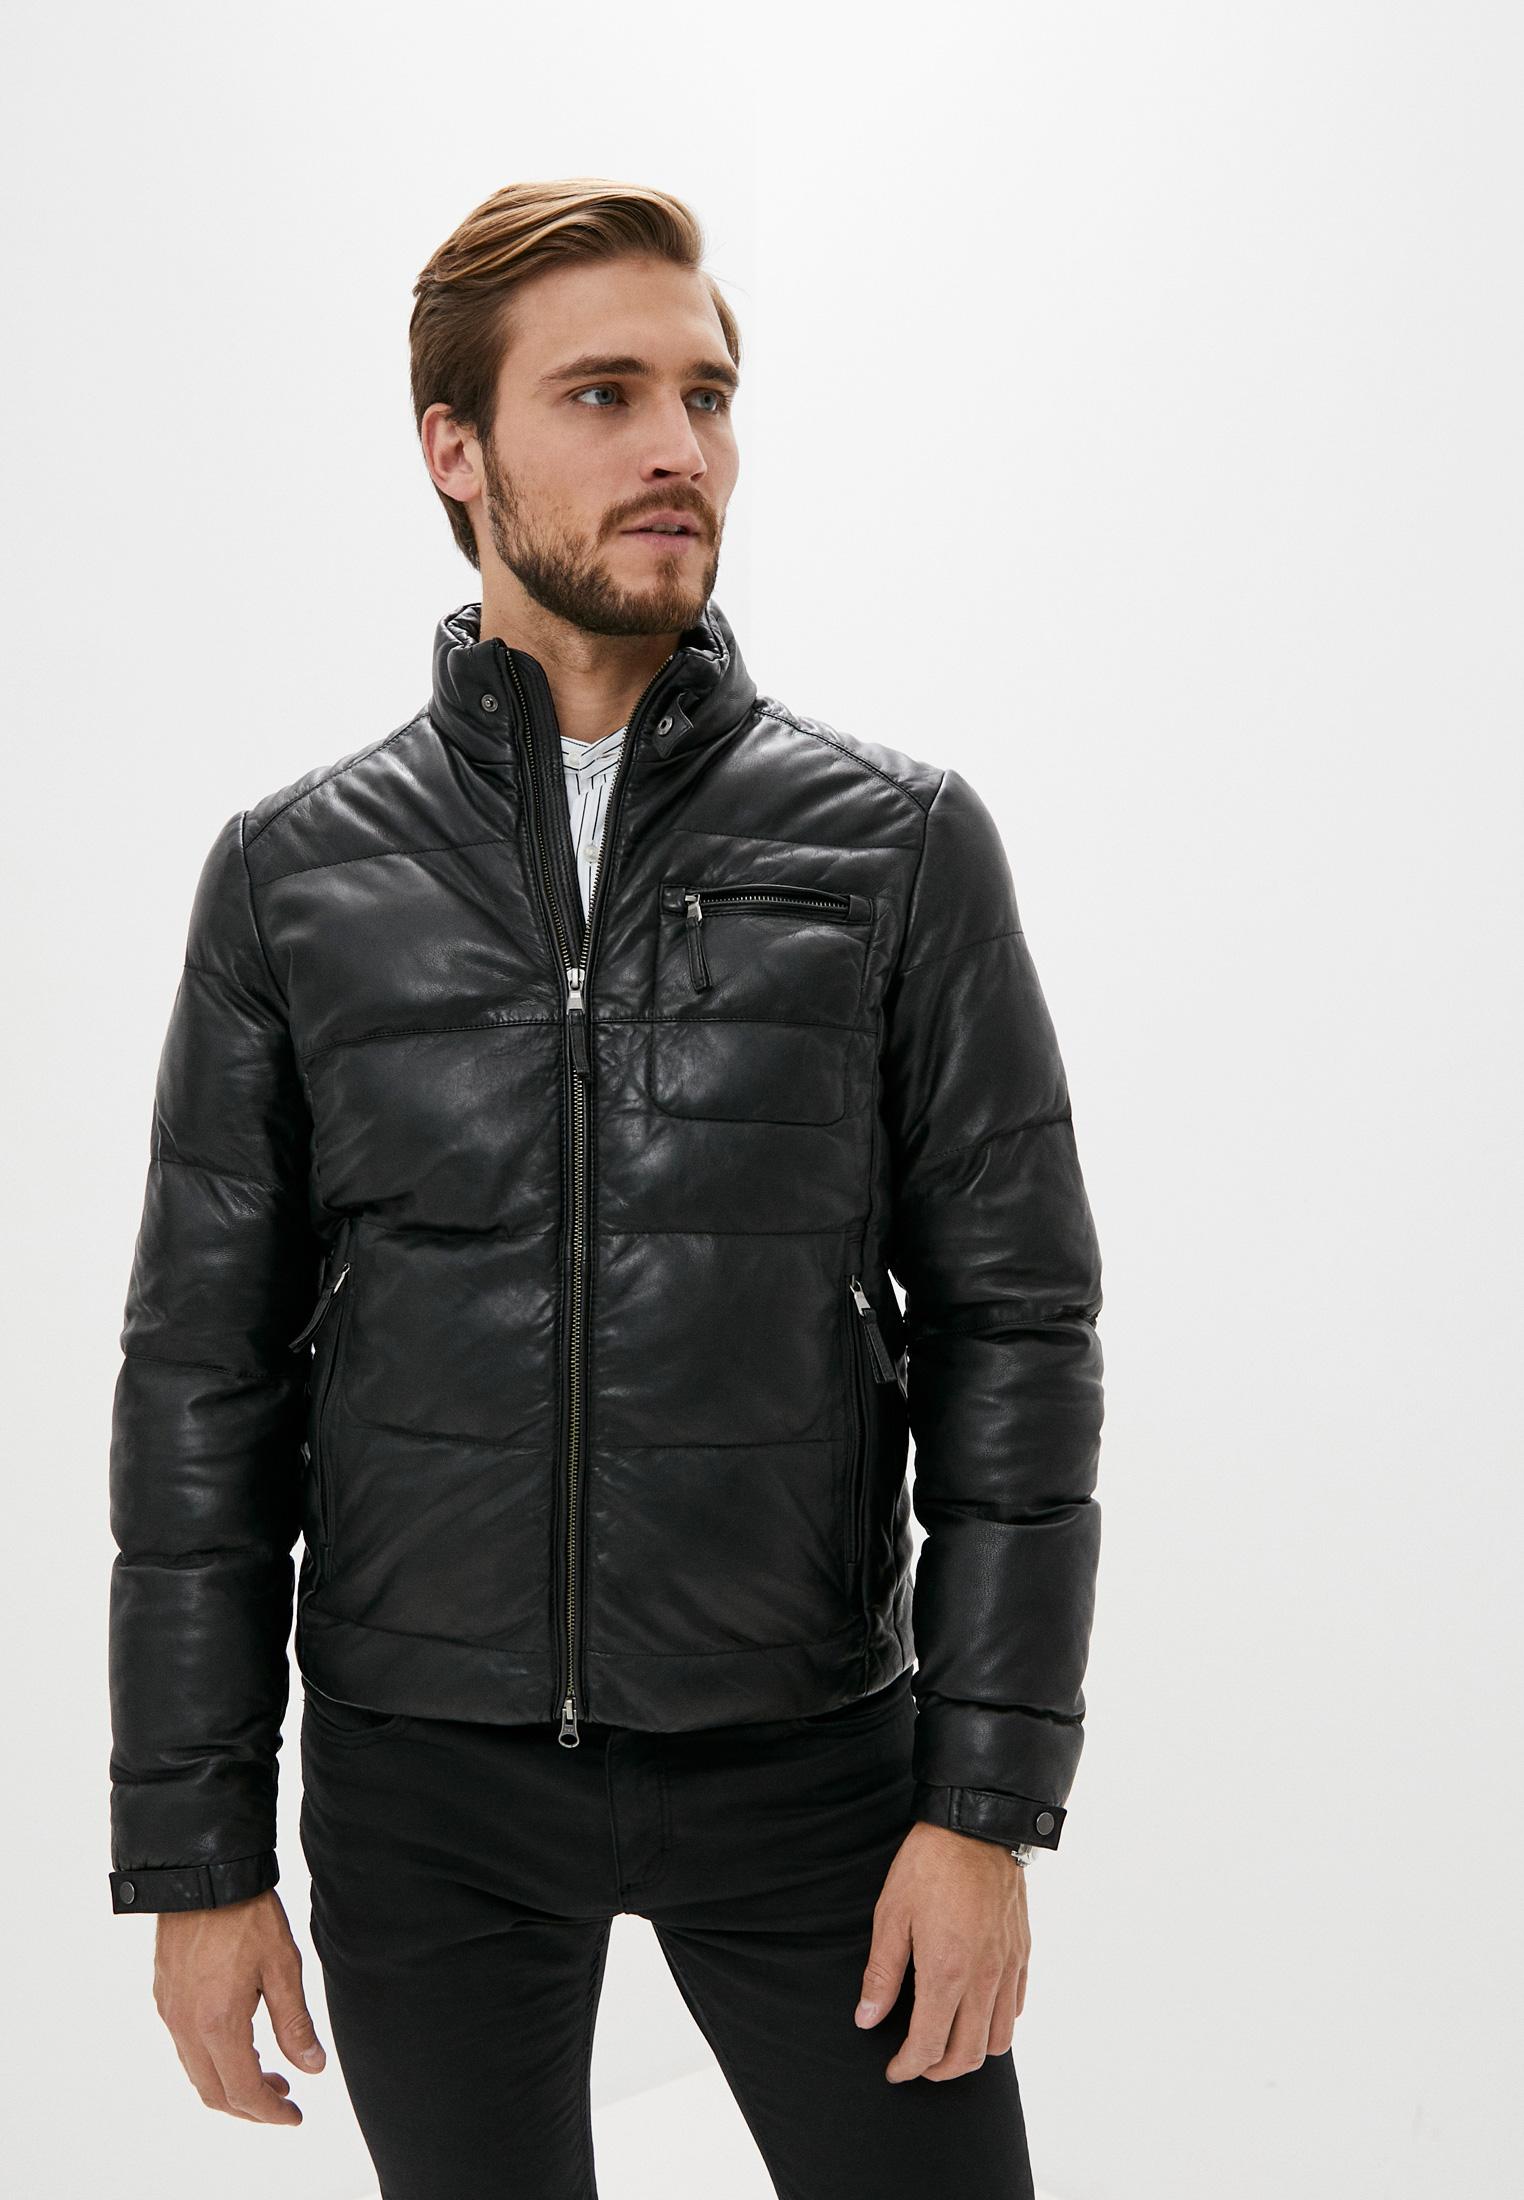 Кожаная куртка Blouson 606nappa paris